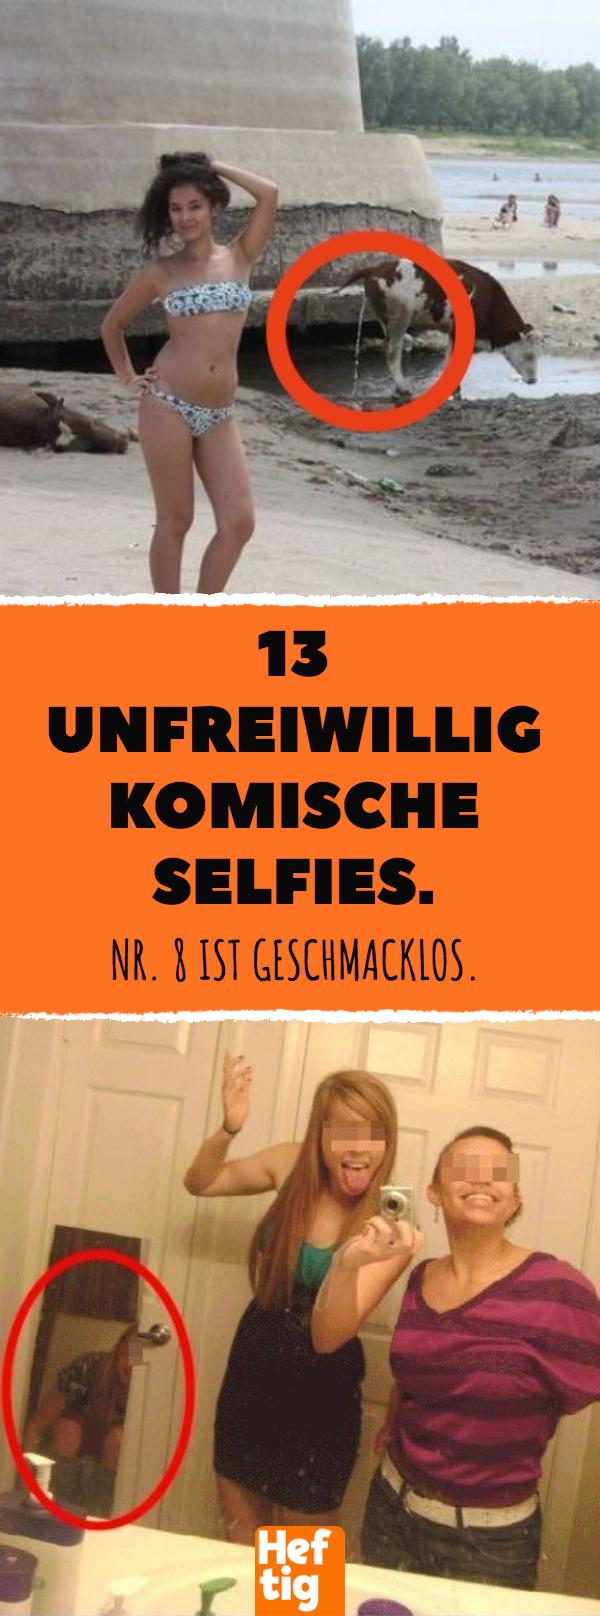 13 unfreiwillig komische selfies selfie selfiefail fail panne lustig fotopanne. Black Bedroom Furniture Sets. Home Design Ideas